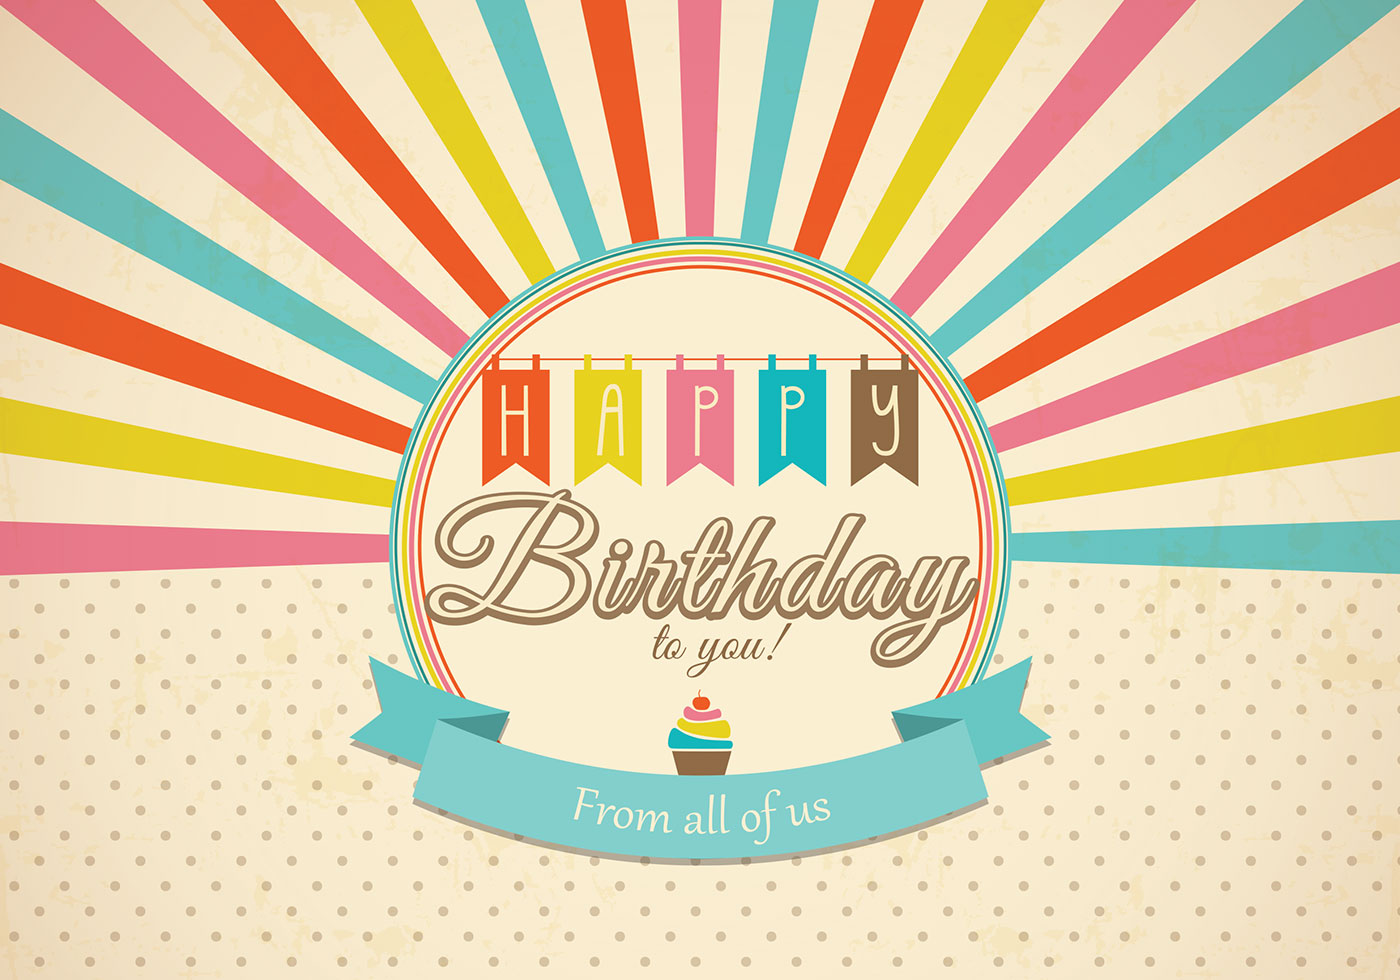 Retro Happy Birthday Card Psd Free Photoshop Brushes At Brusheezy